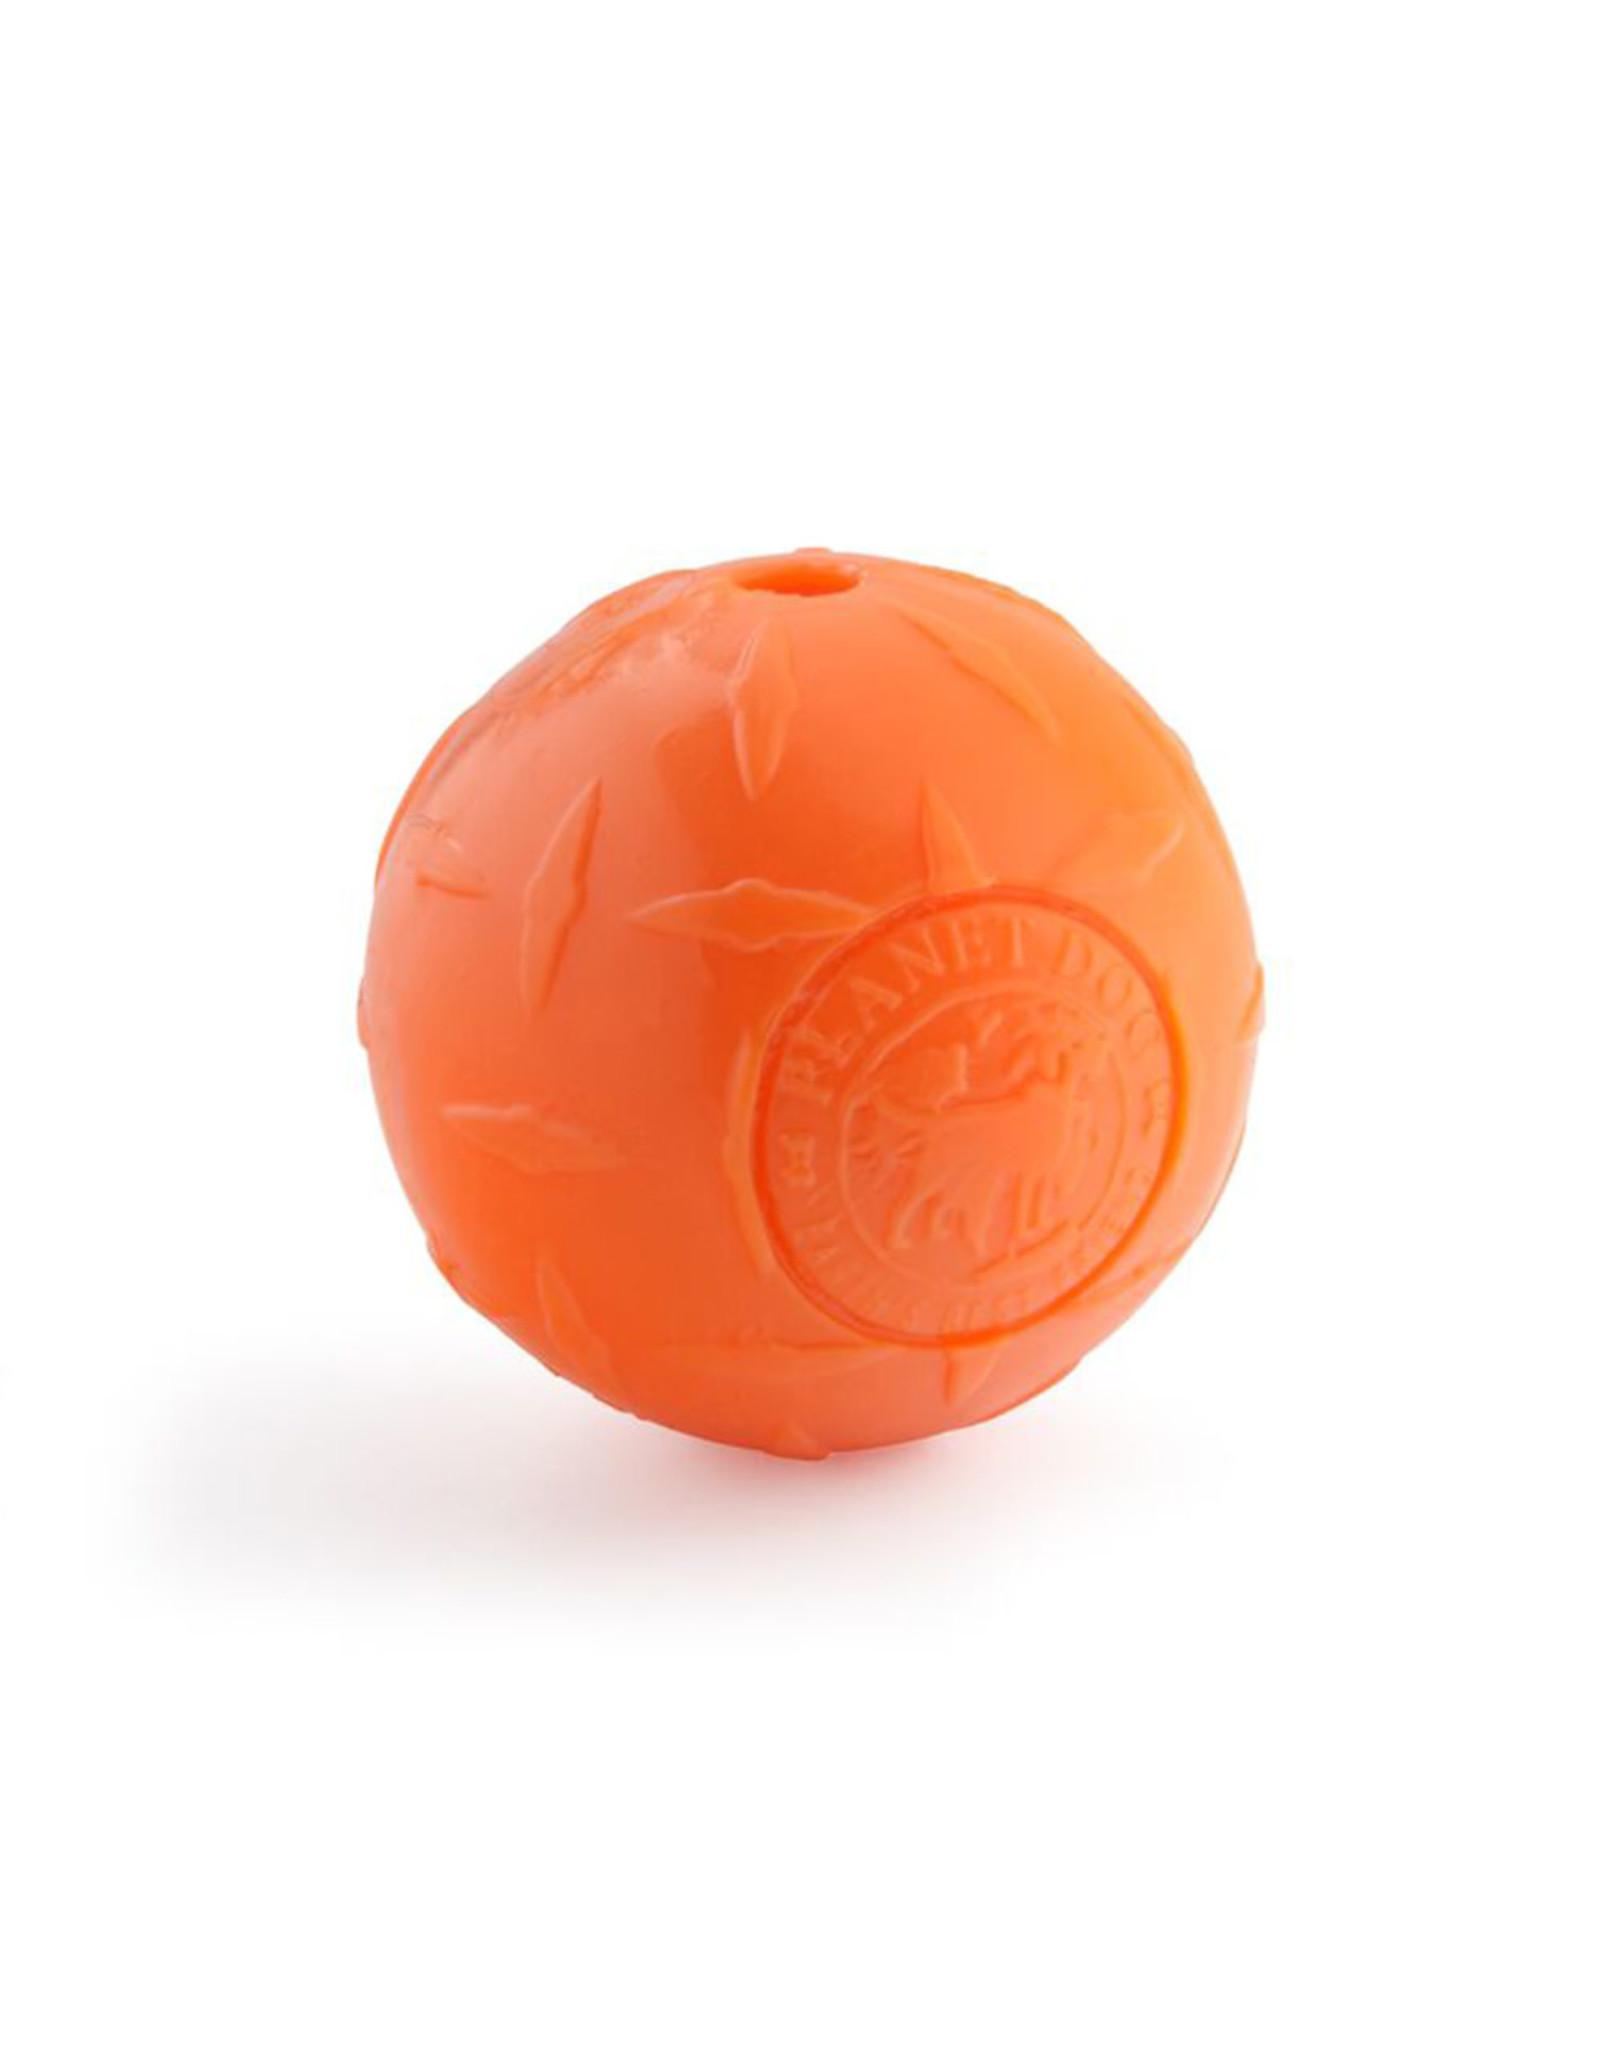 Planet Dog Planet Dog Diamond Plate Ball: Orange, 3 inch